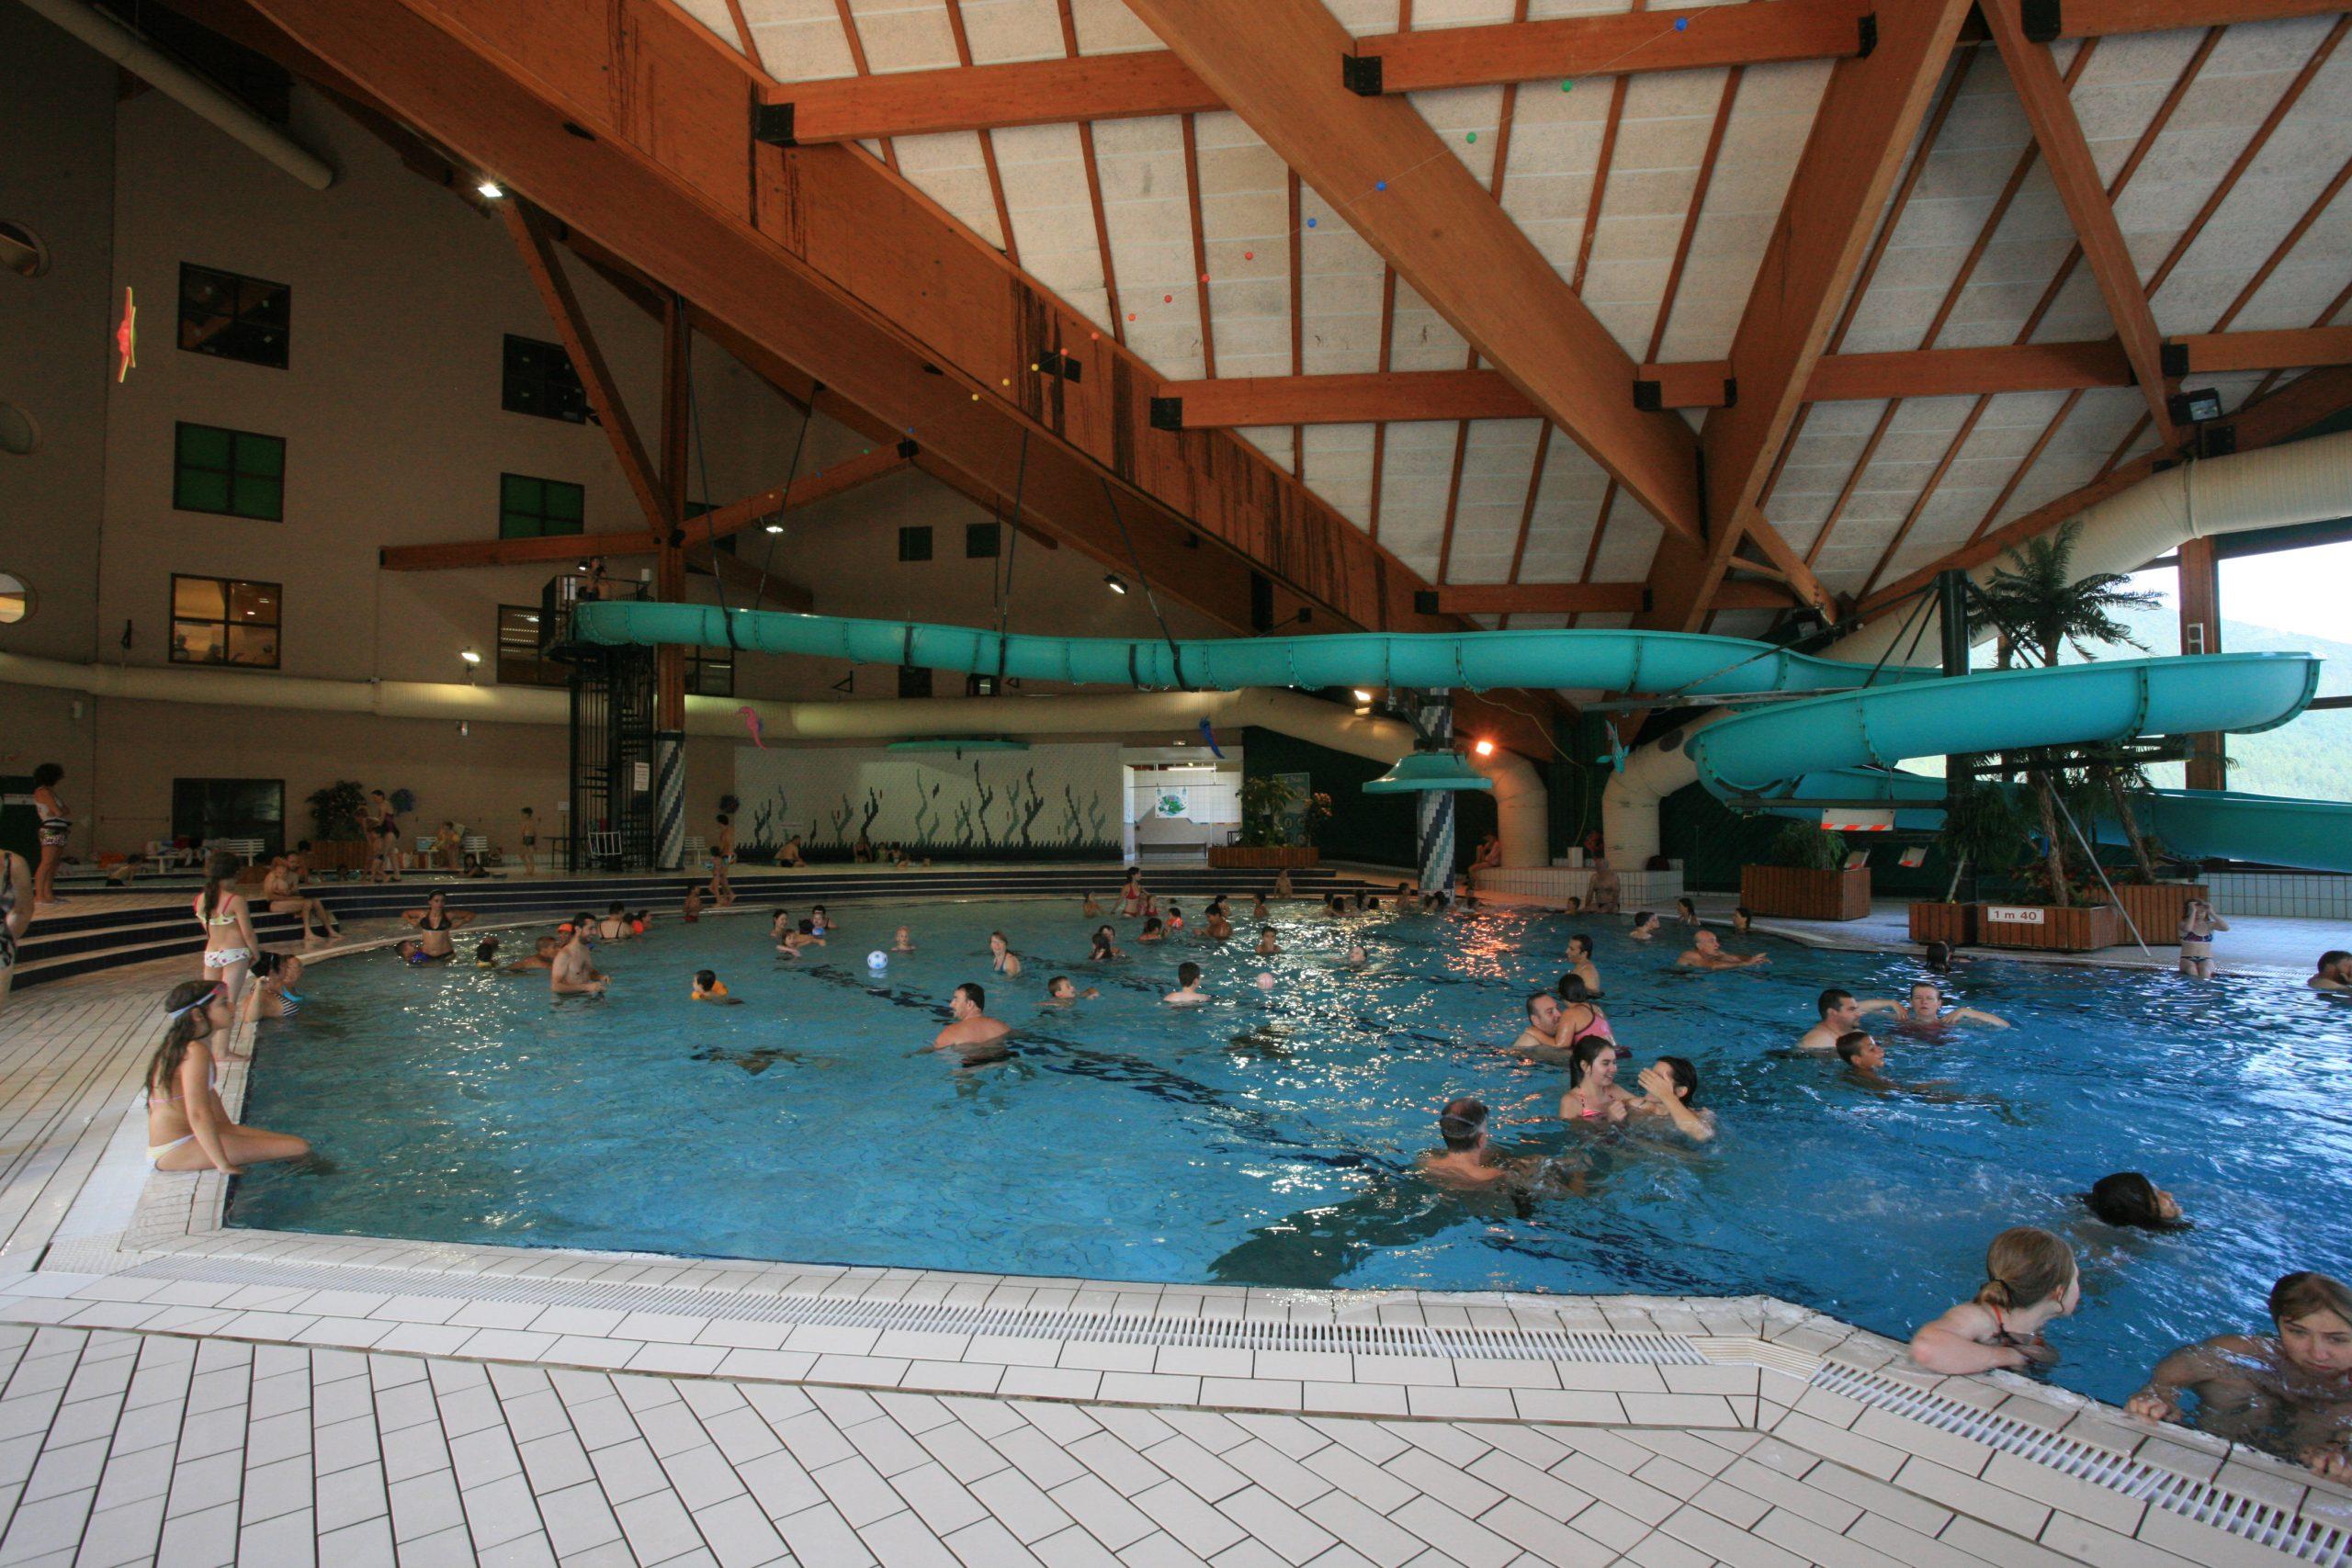 Centre Aquatique De Villard De Lans   Notrebellefrance avec Piscine Villard De Lans